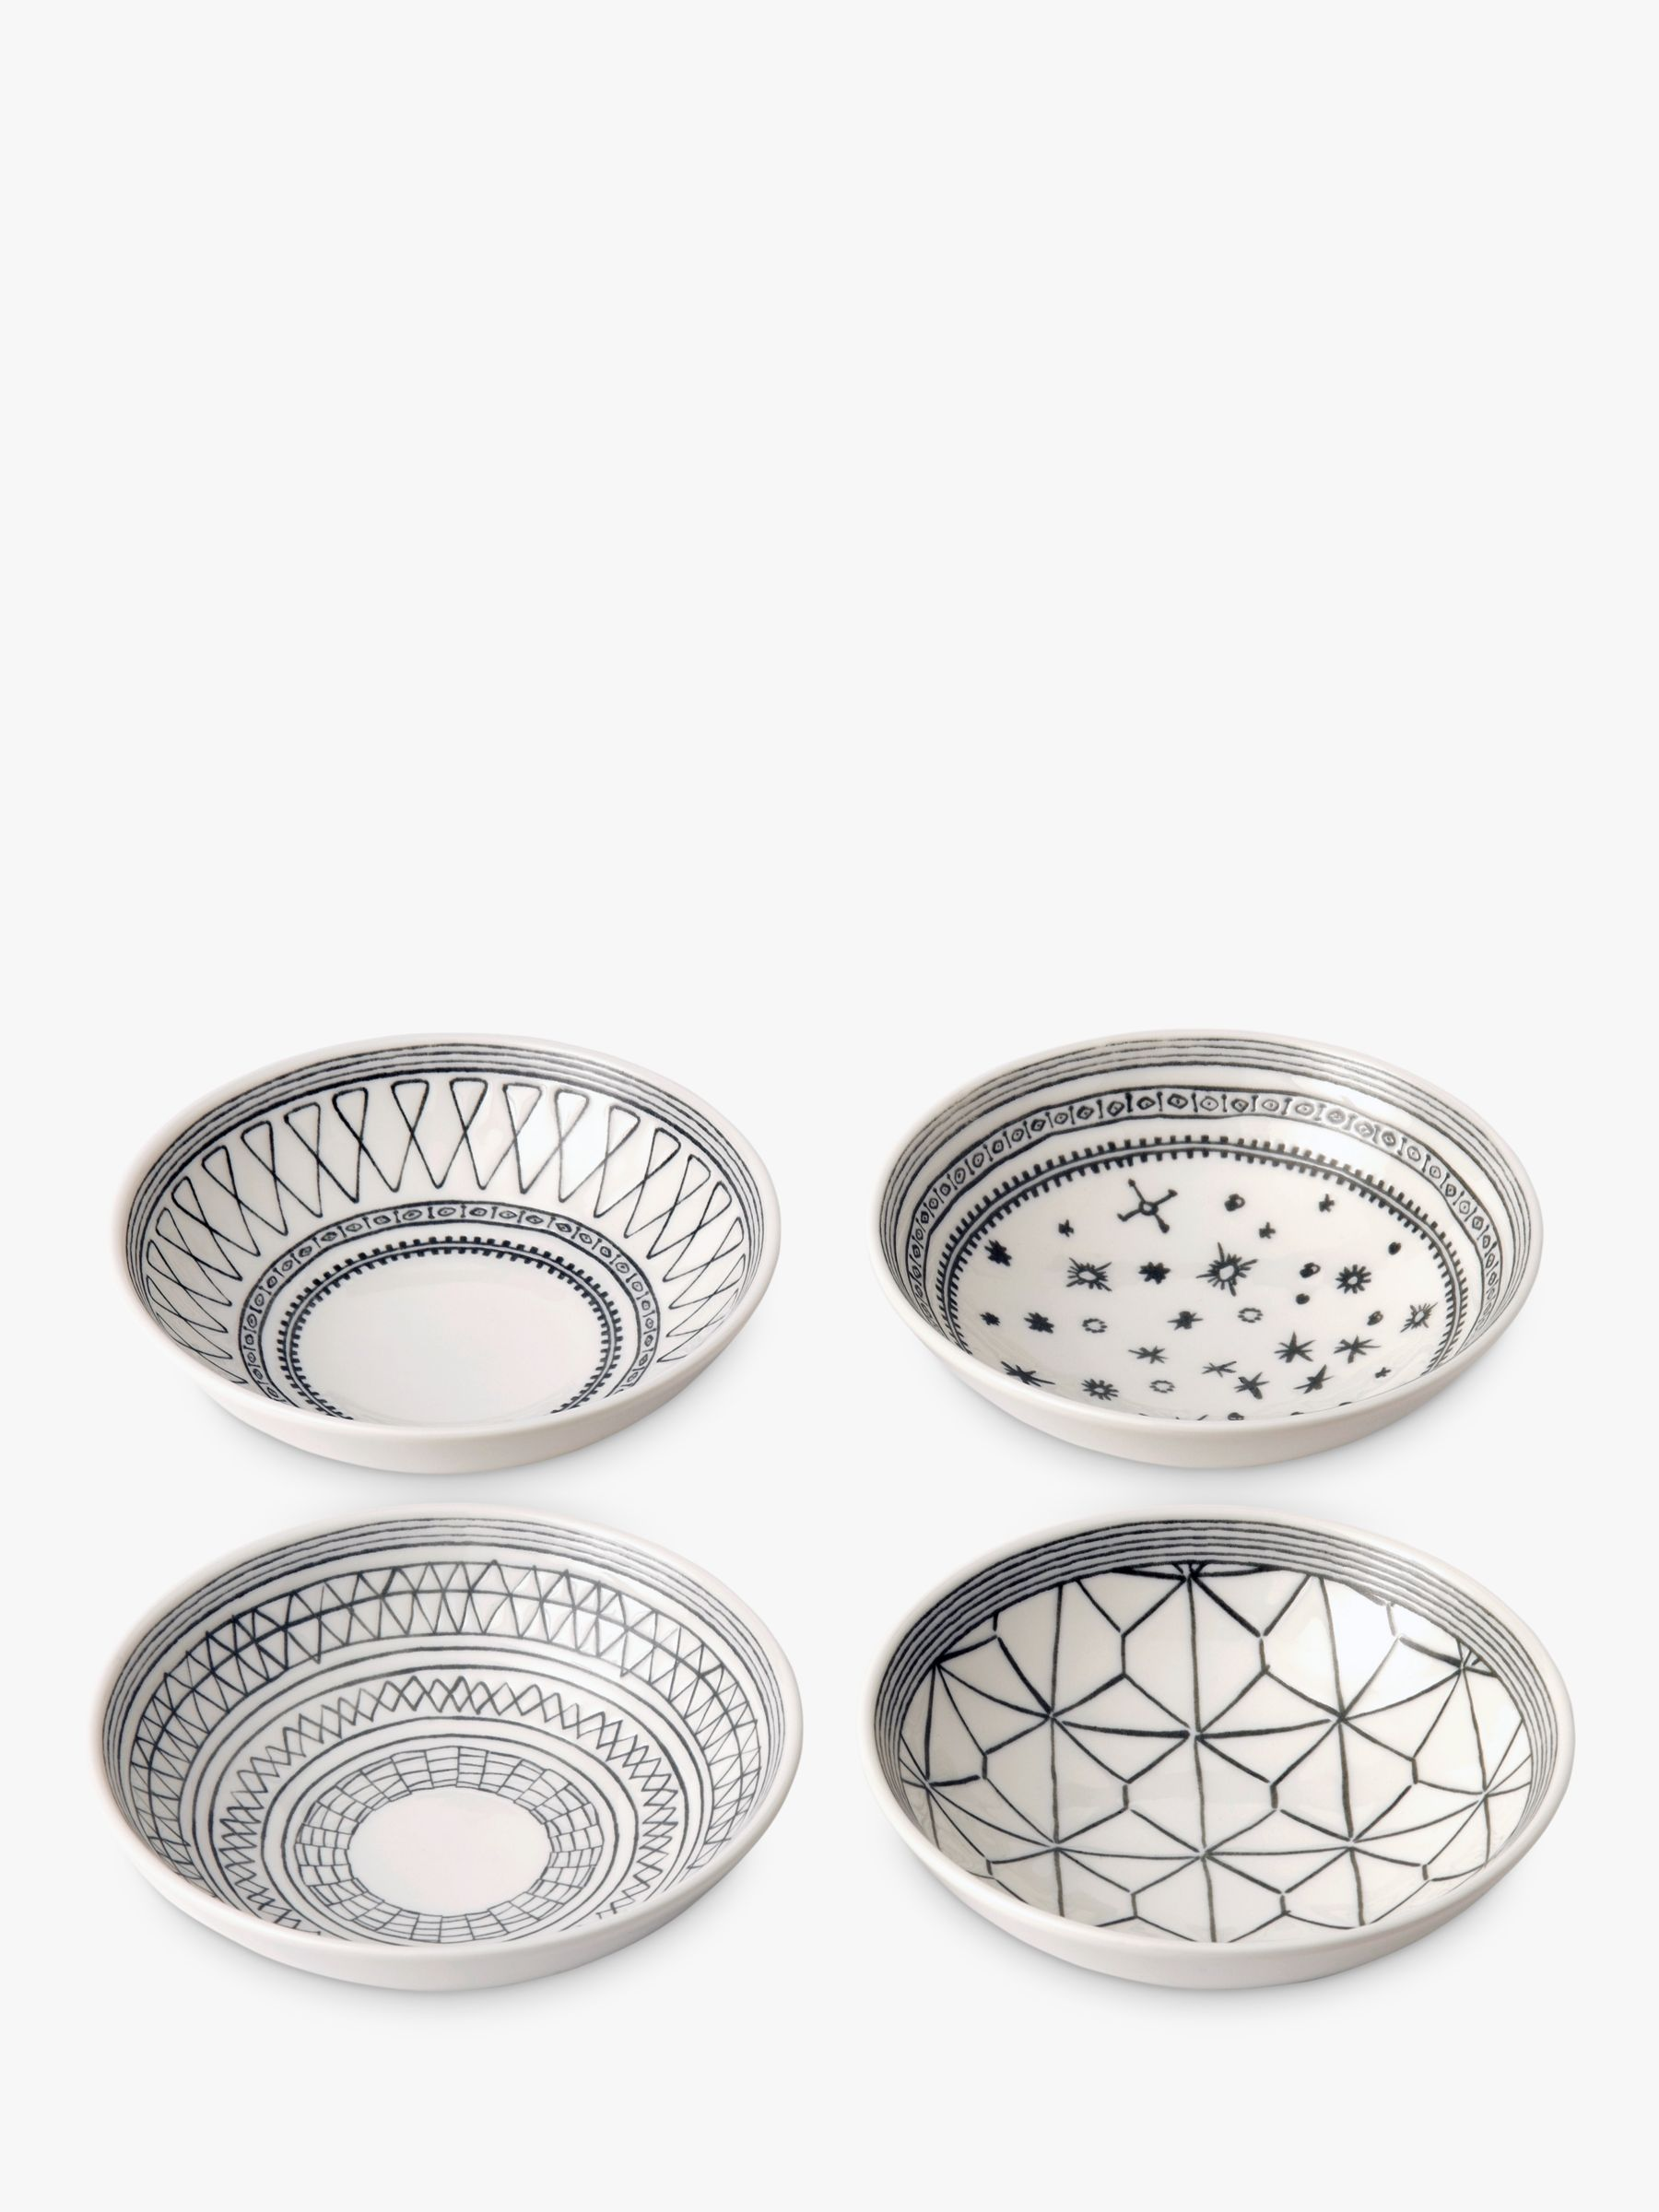 Royal Doulton ED Ellen DeGeneres for Royal Doulton Bowls, Charcoal Grey, Dia.14cm, Set of 4